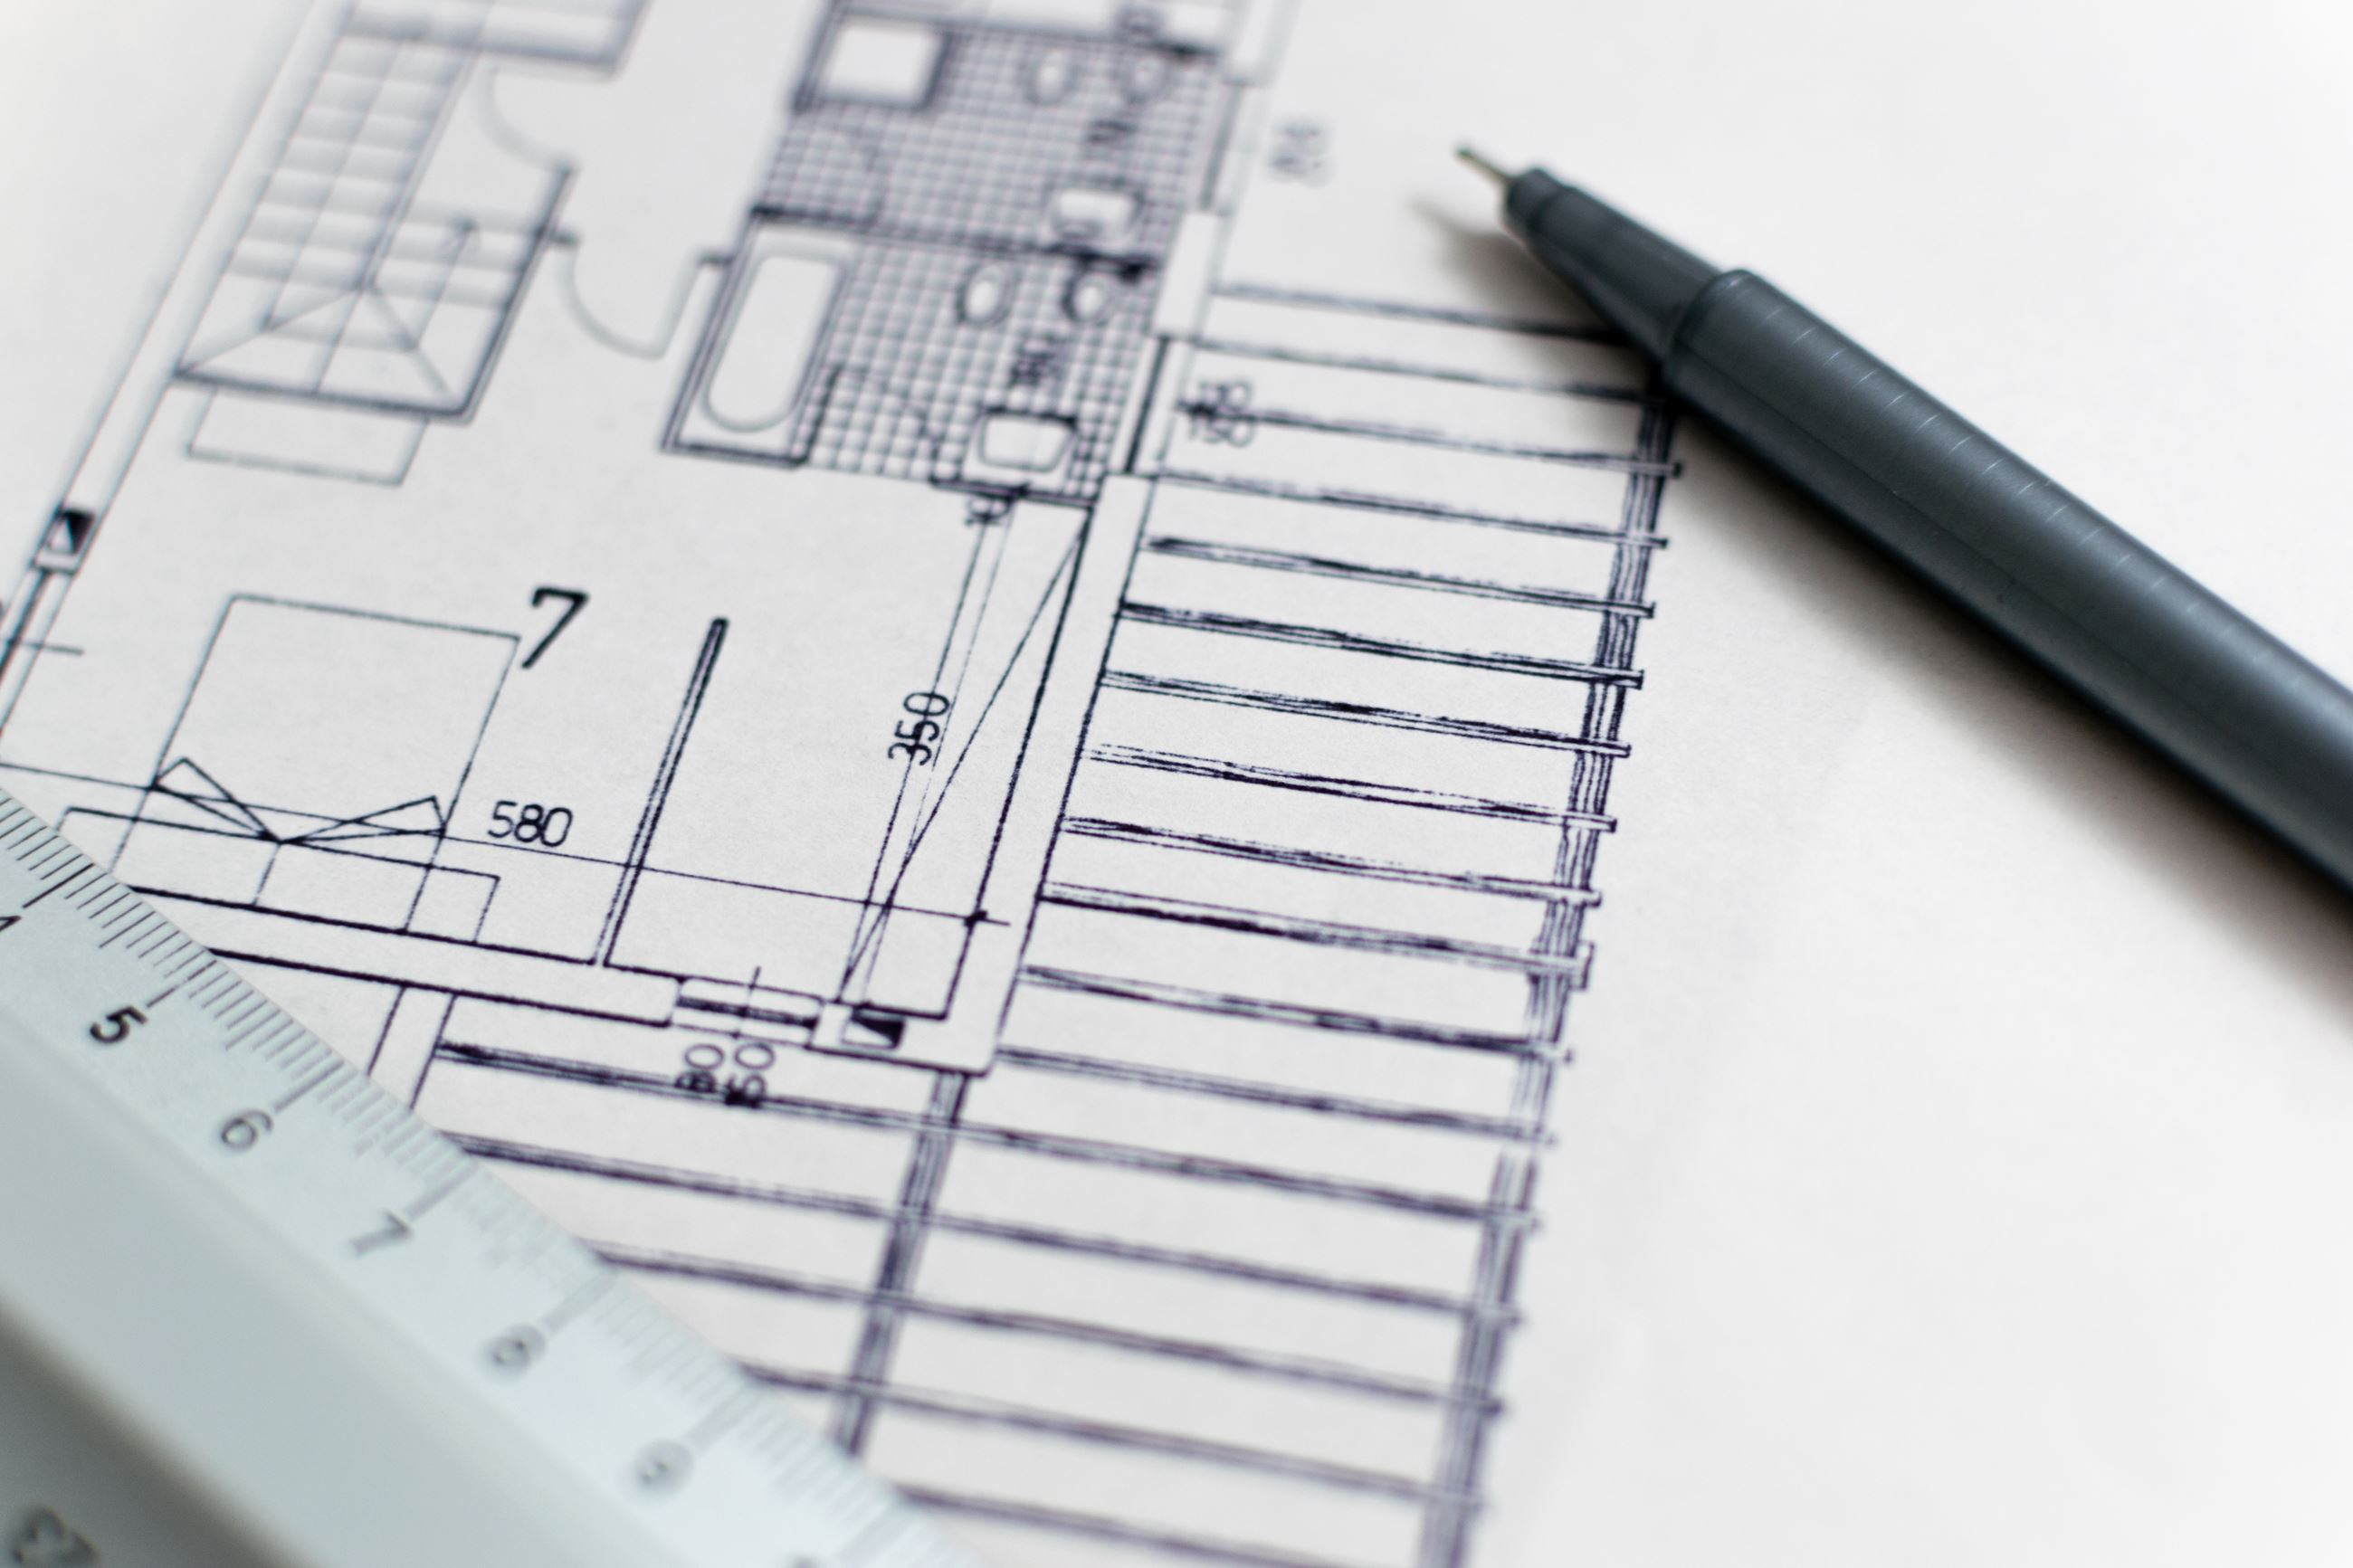 Planning department image